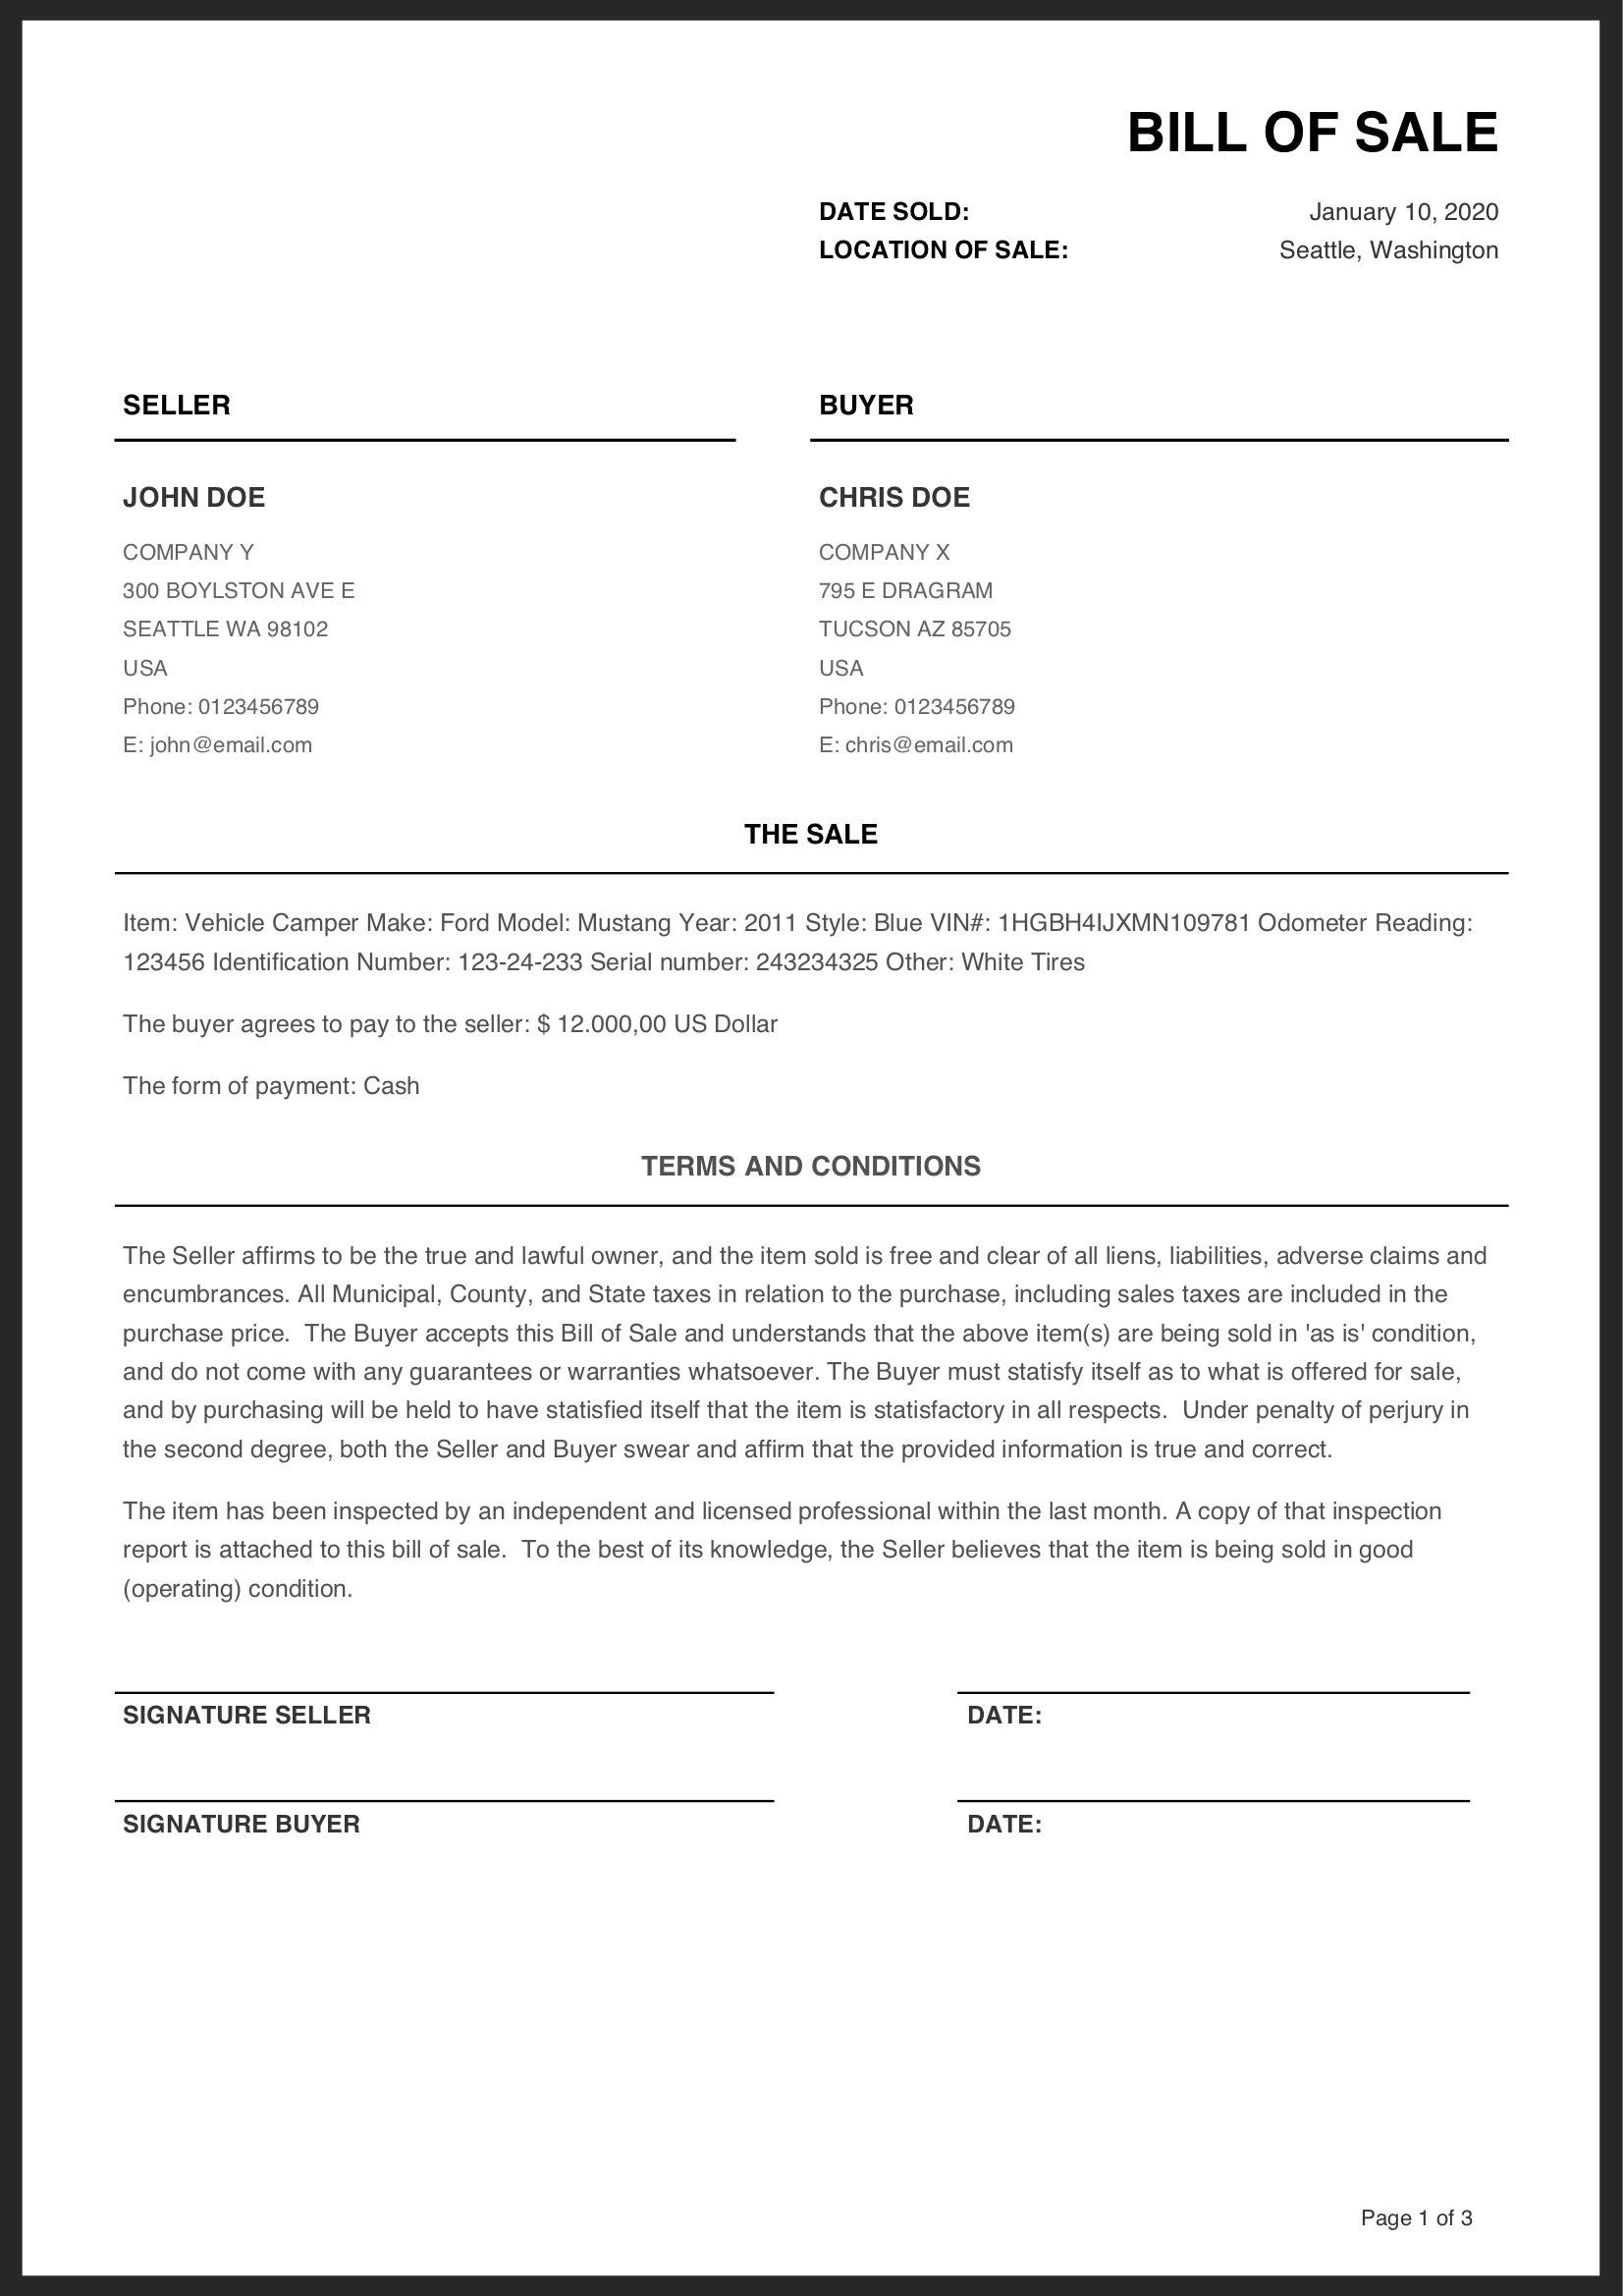 001 Wonderful Printable Bill Of Sale Template Highest Quality  Word Saskatchewan Free Used Car OntarioFull